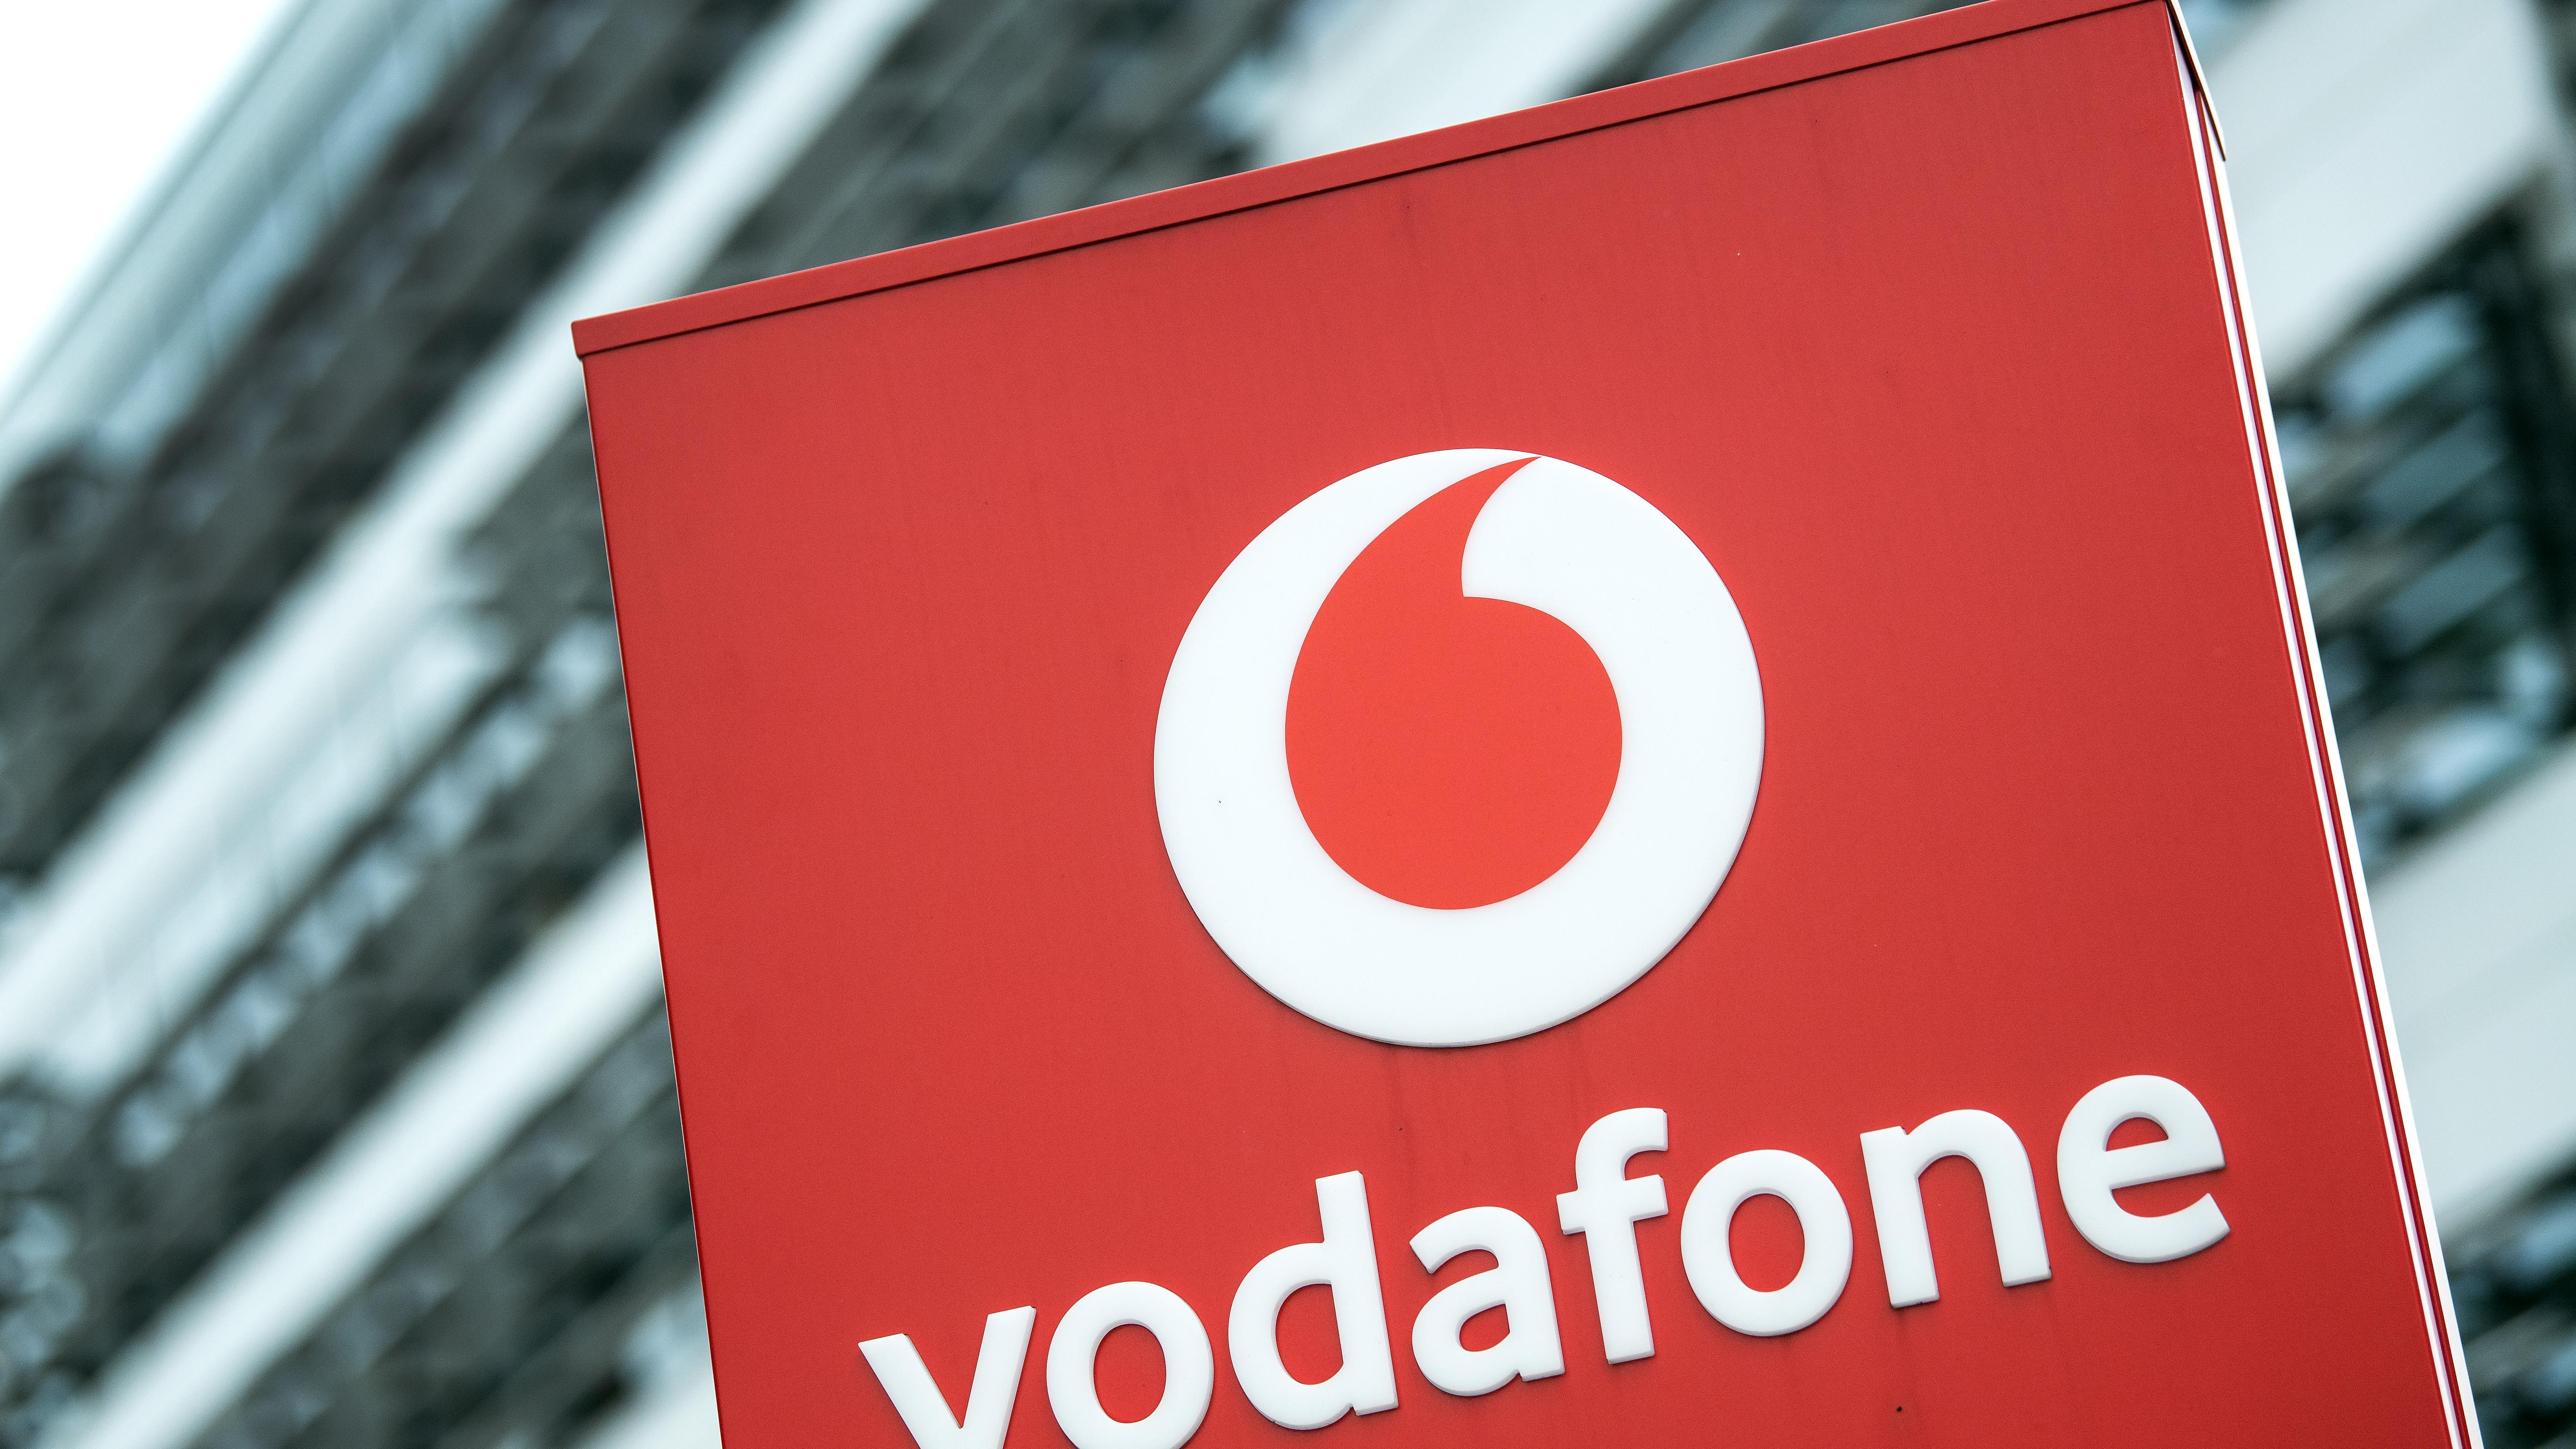 Vodafone Router blinkt rot: Das bedeutet es